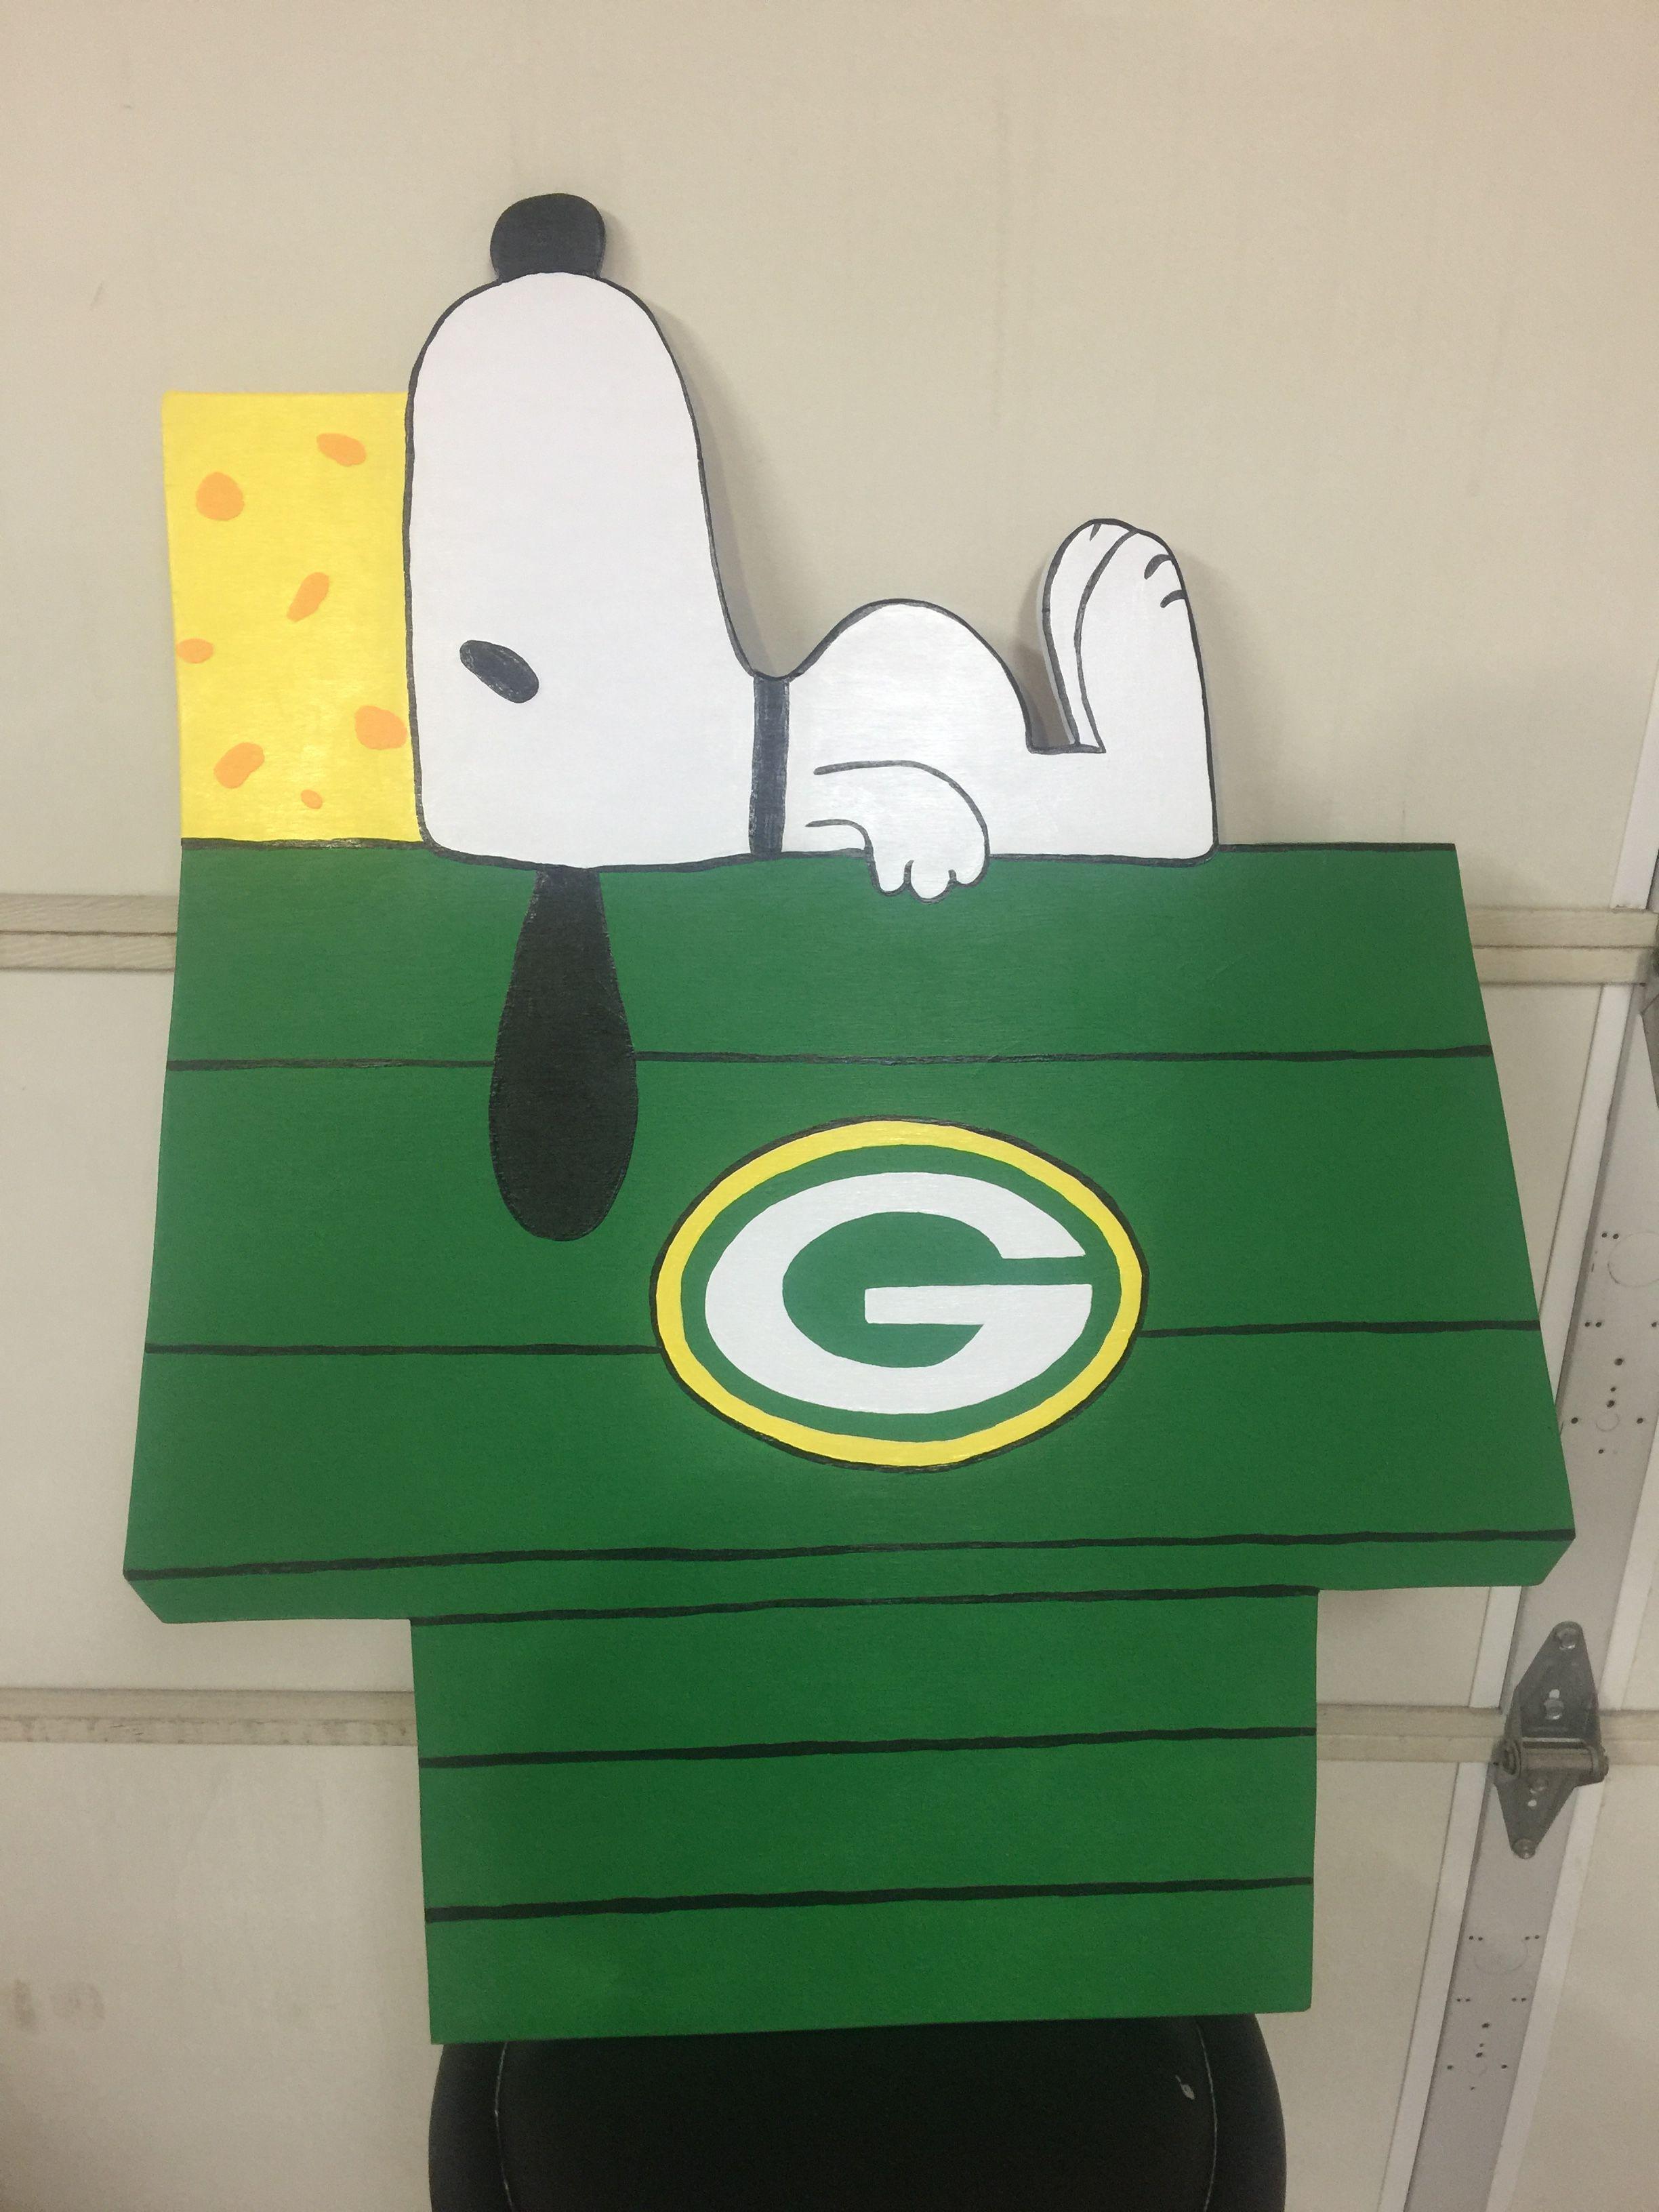 Green Bay Packers Green Bay Packers Crafts Green Bay Packers Wallpaper Green Bay Packers